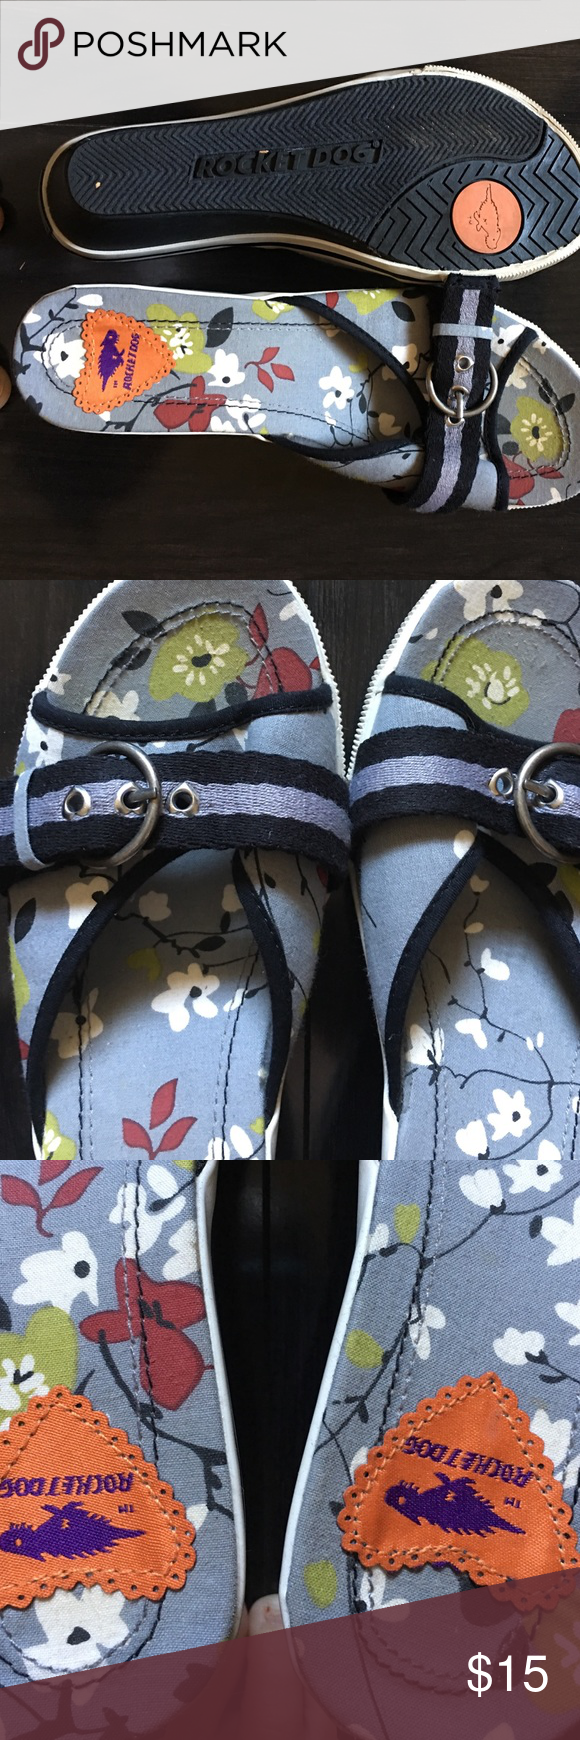 Rocket dog size 8 sandals Super cute, size 8 , rocket dog adjustable sandals. Like new. Rocket Dog Shoes Sandals